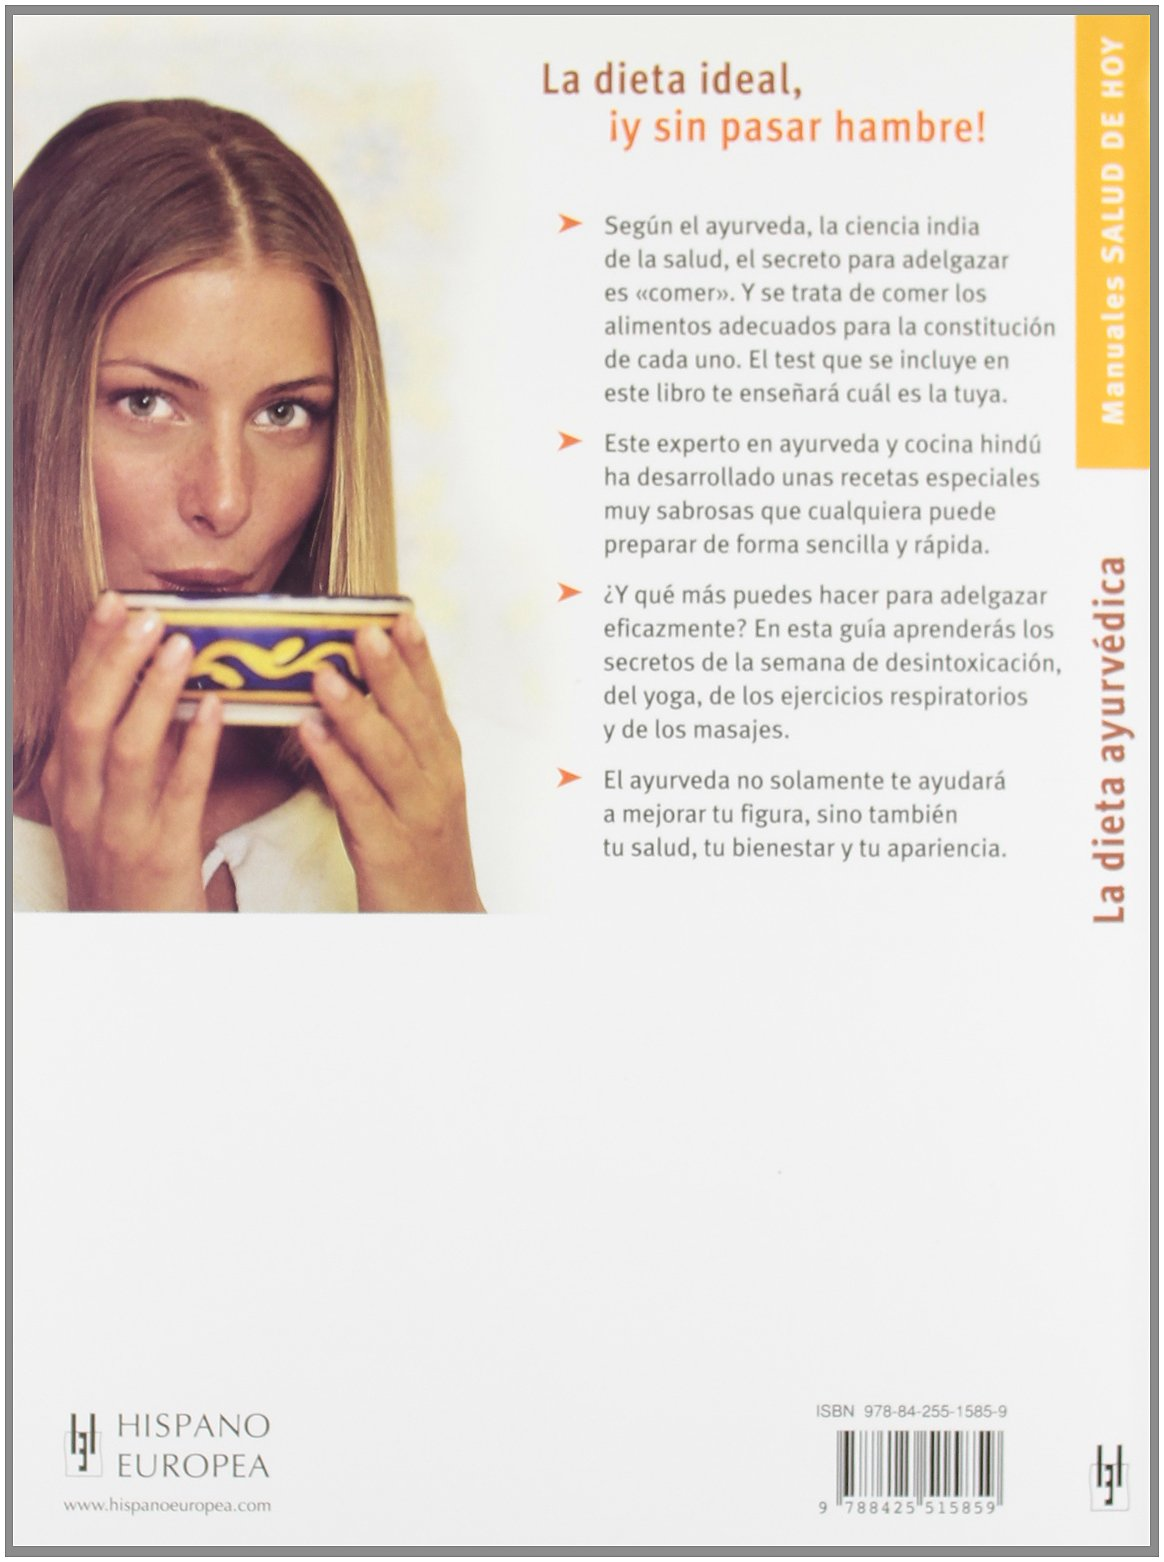 Dieta ayurveda para adelgazar test